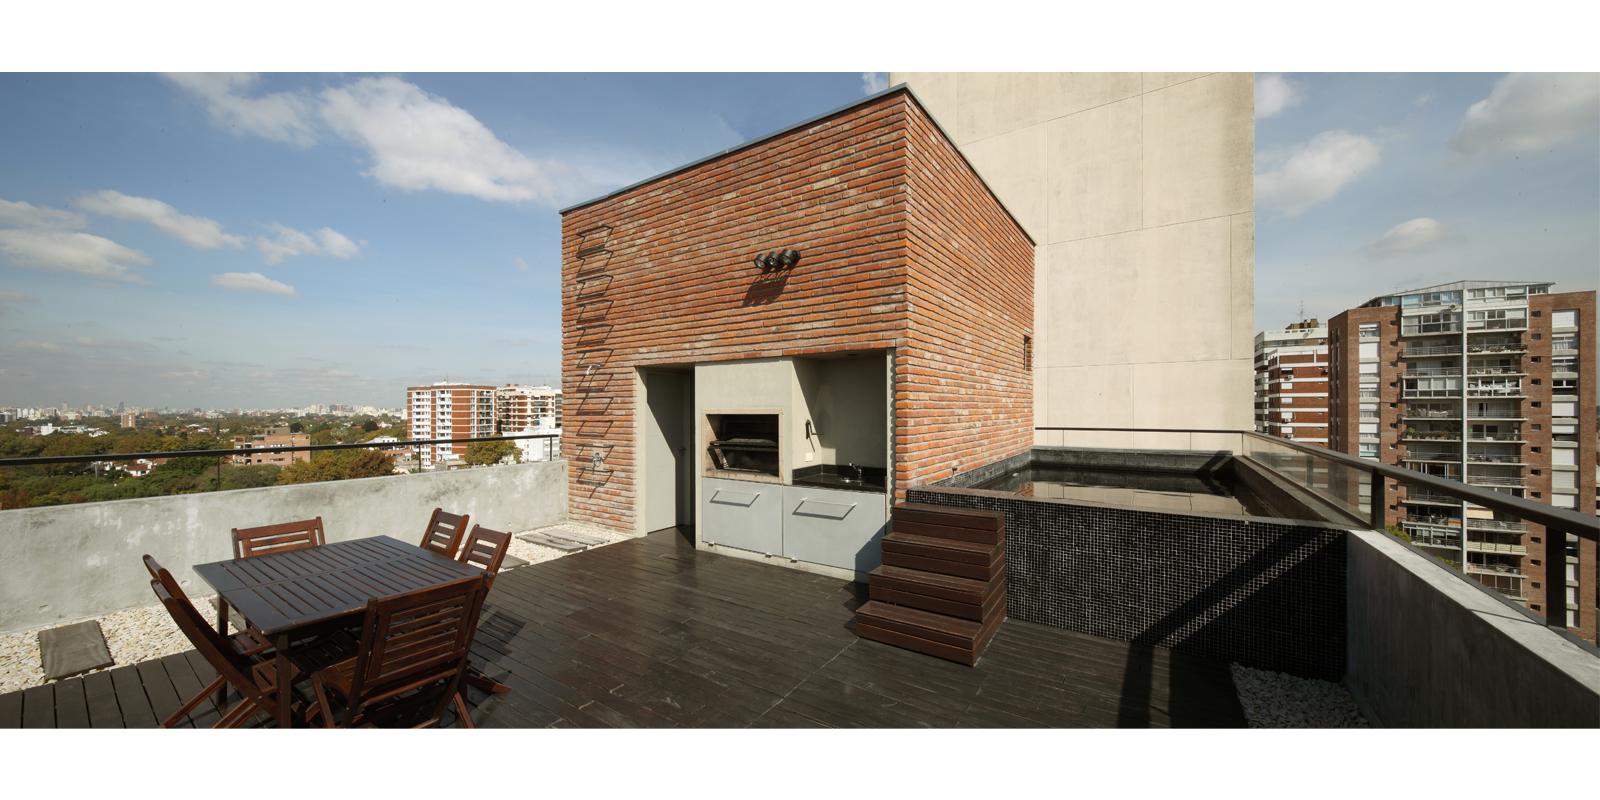 ProyectoC_Arquitectos_Portfolio_08_VicenteLopez